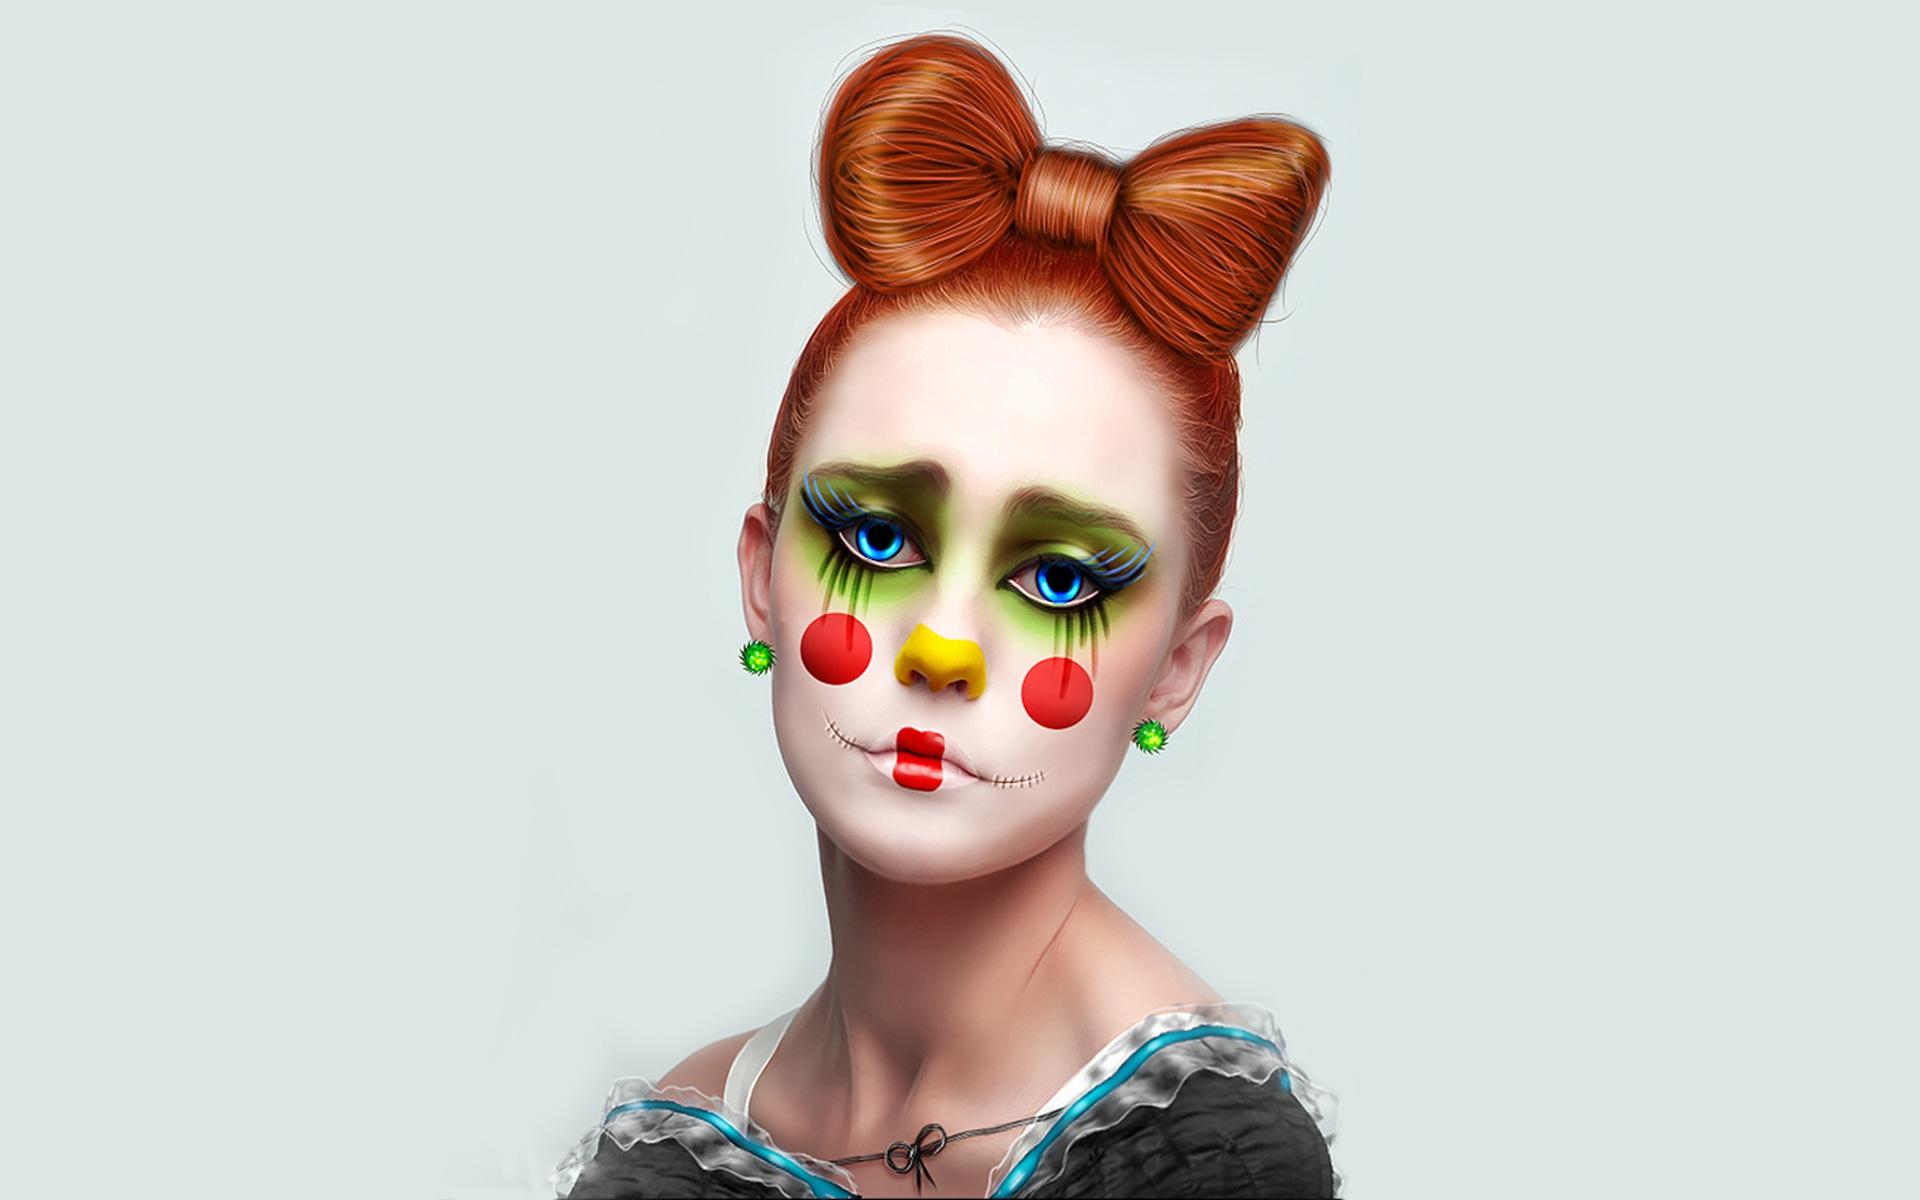 Download Wallpaper 1920x1200 Clown girl, brown hair HD ...